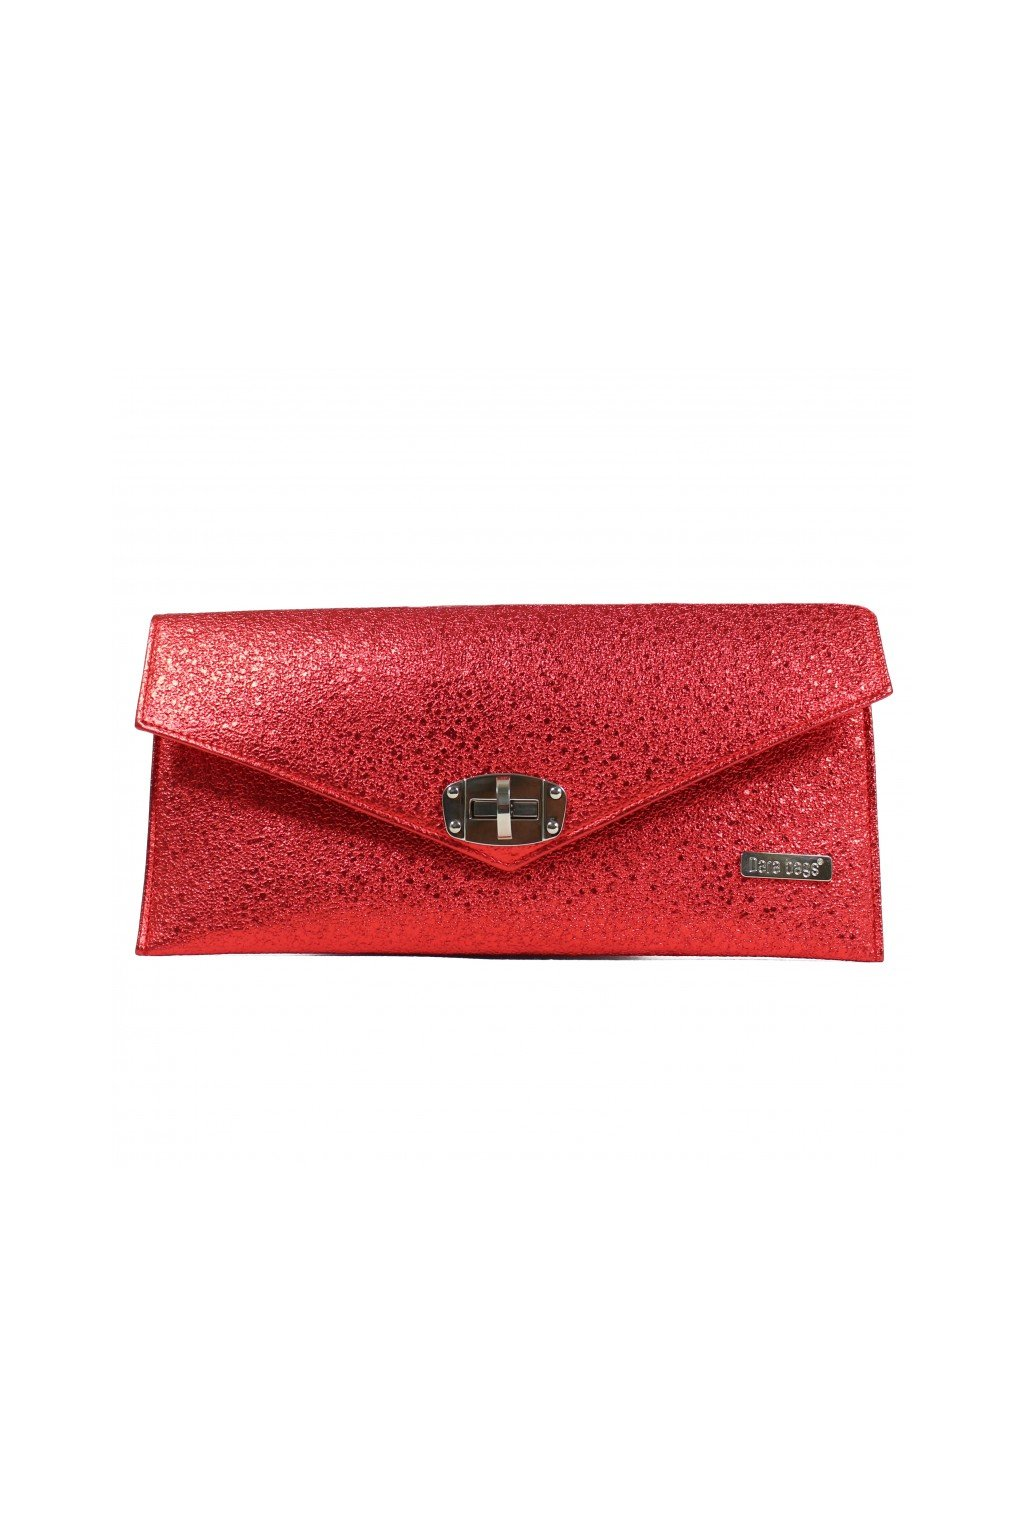 Mala trpytiva kabelka Malibu Classy Dara bags cervena 1